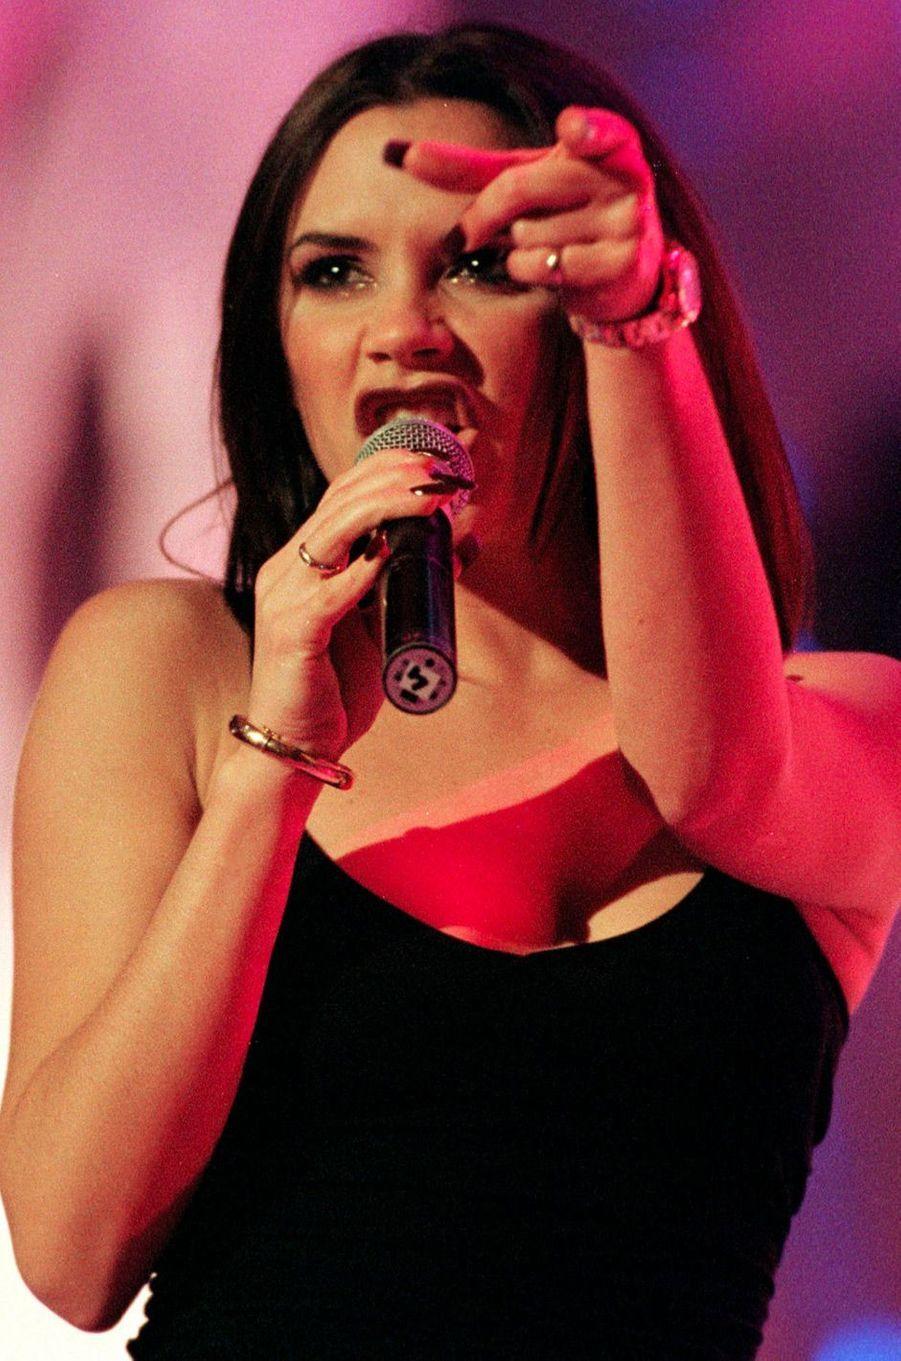 Victoria Beckham, aka Posh Spice, le 20 novembre 1997